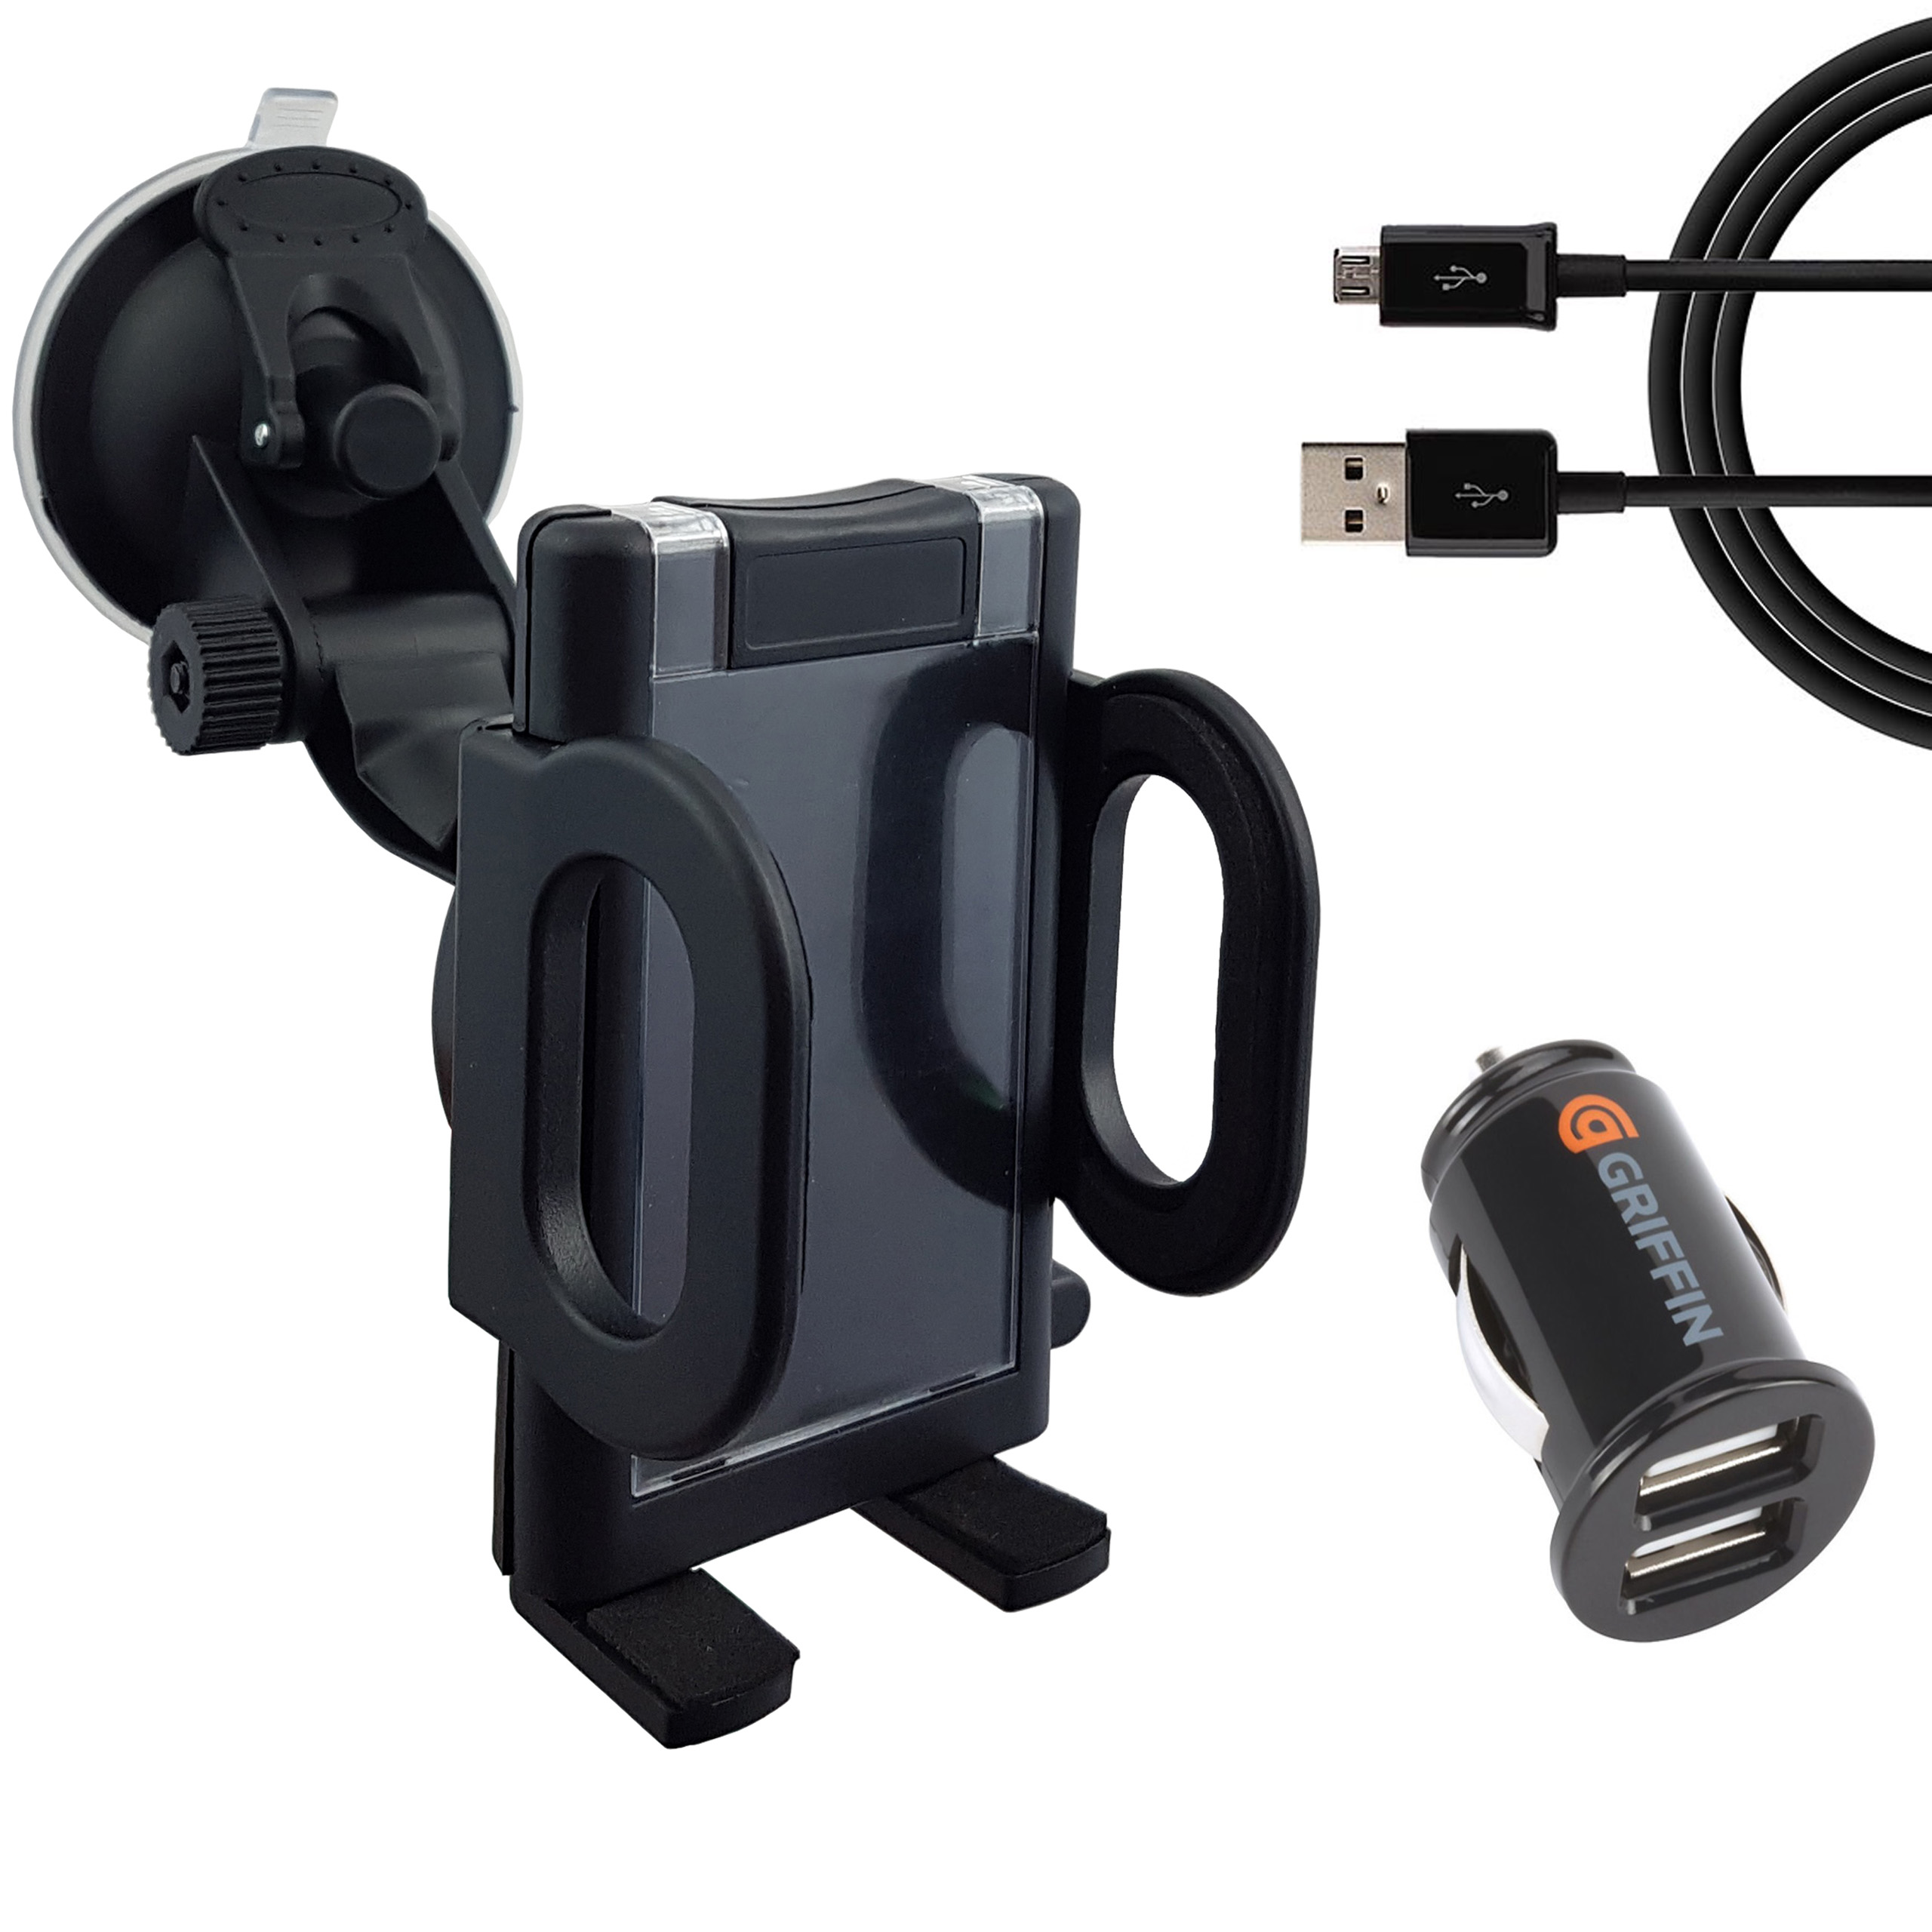 Uchwyt samochodowy Ładowarka Usb 2,1A Micro USB294